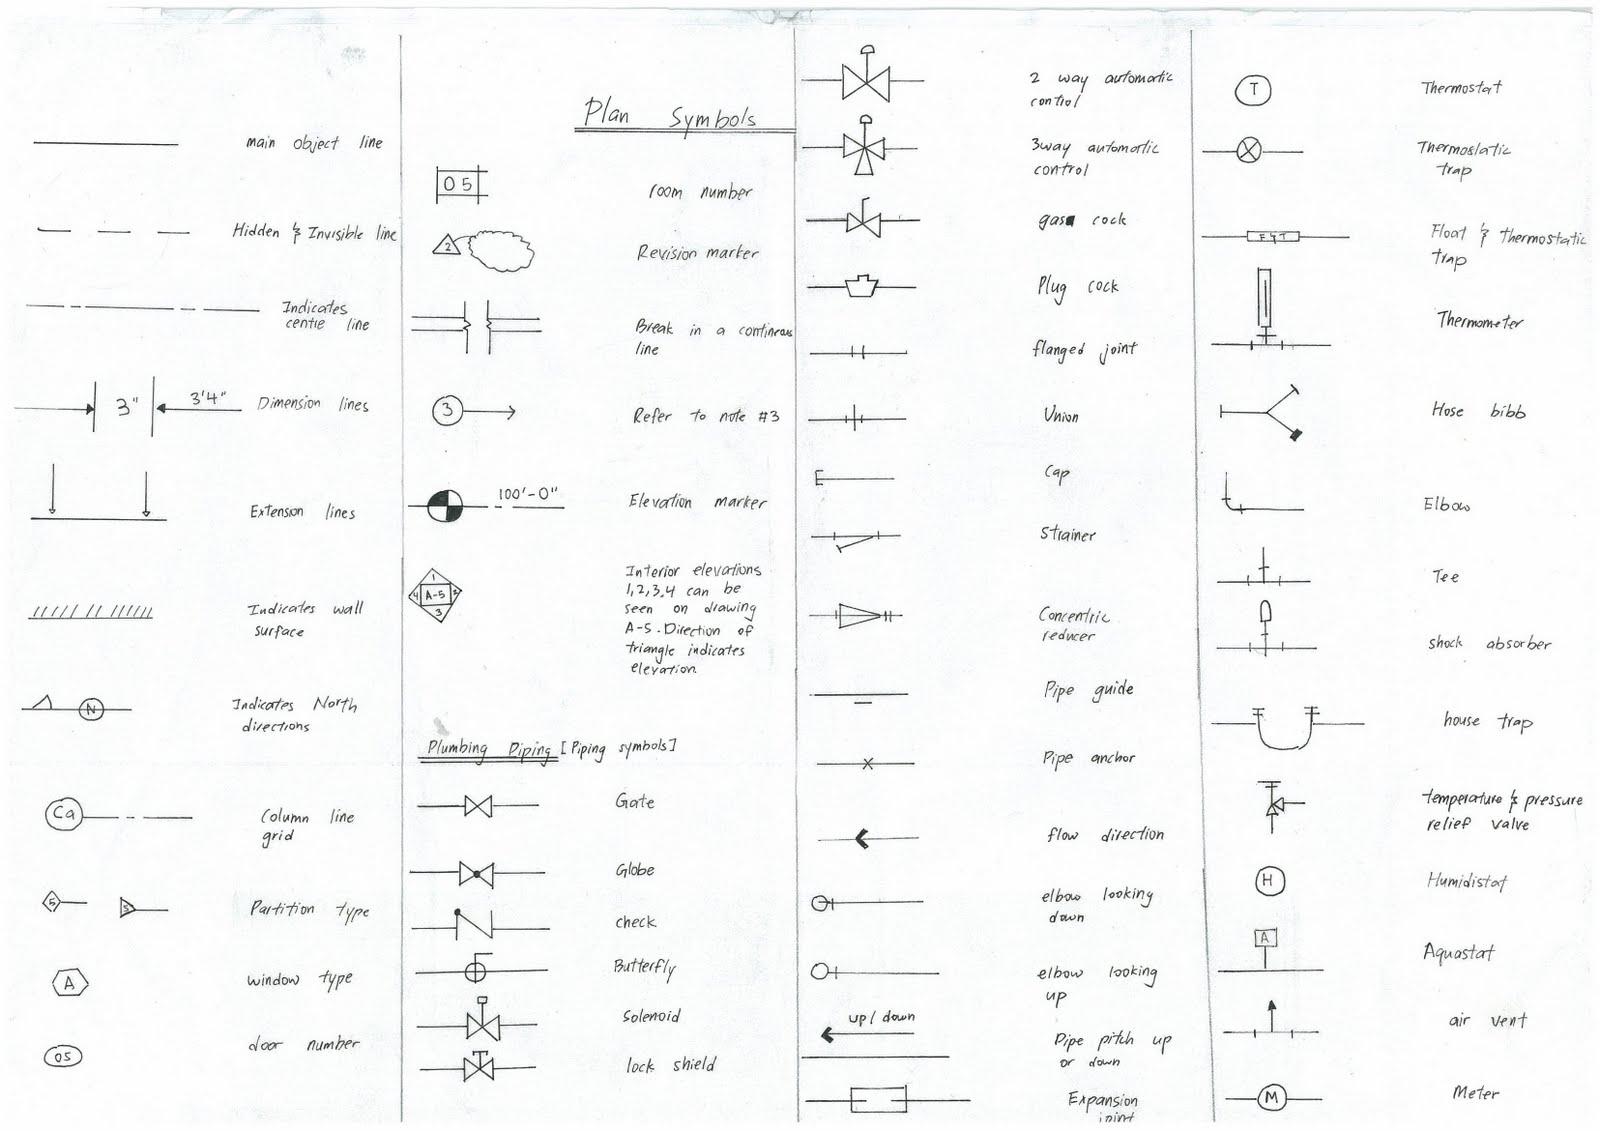 Pencils pen sj 04b drawing templetes plan symbol 1 drawing lines indicators buycottarizona Image collections